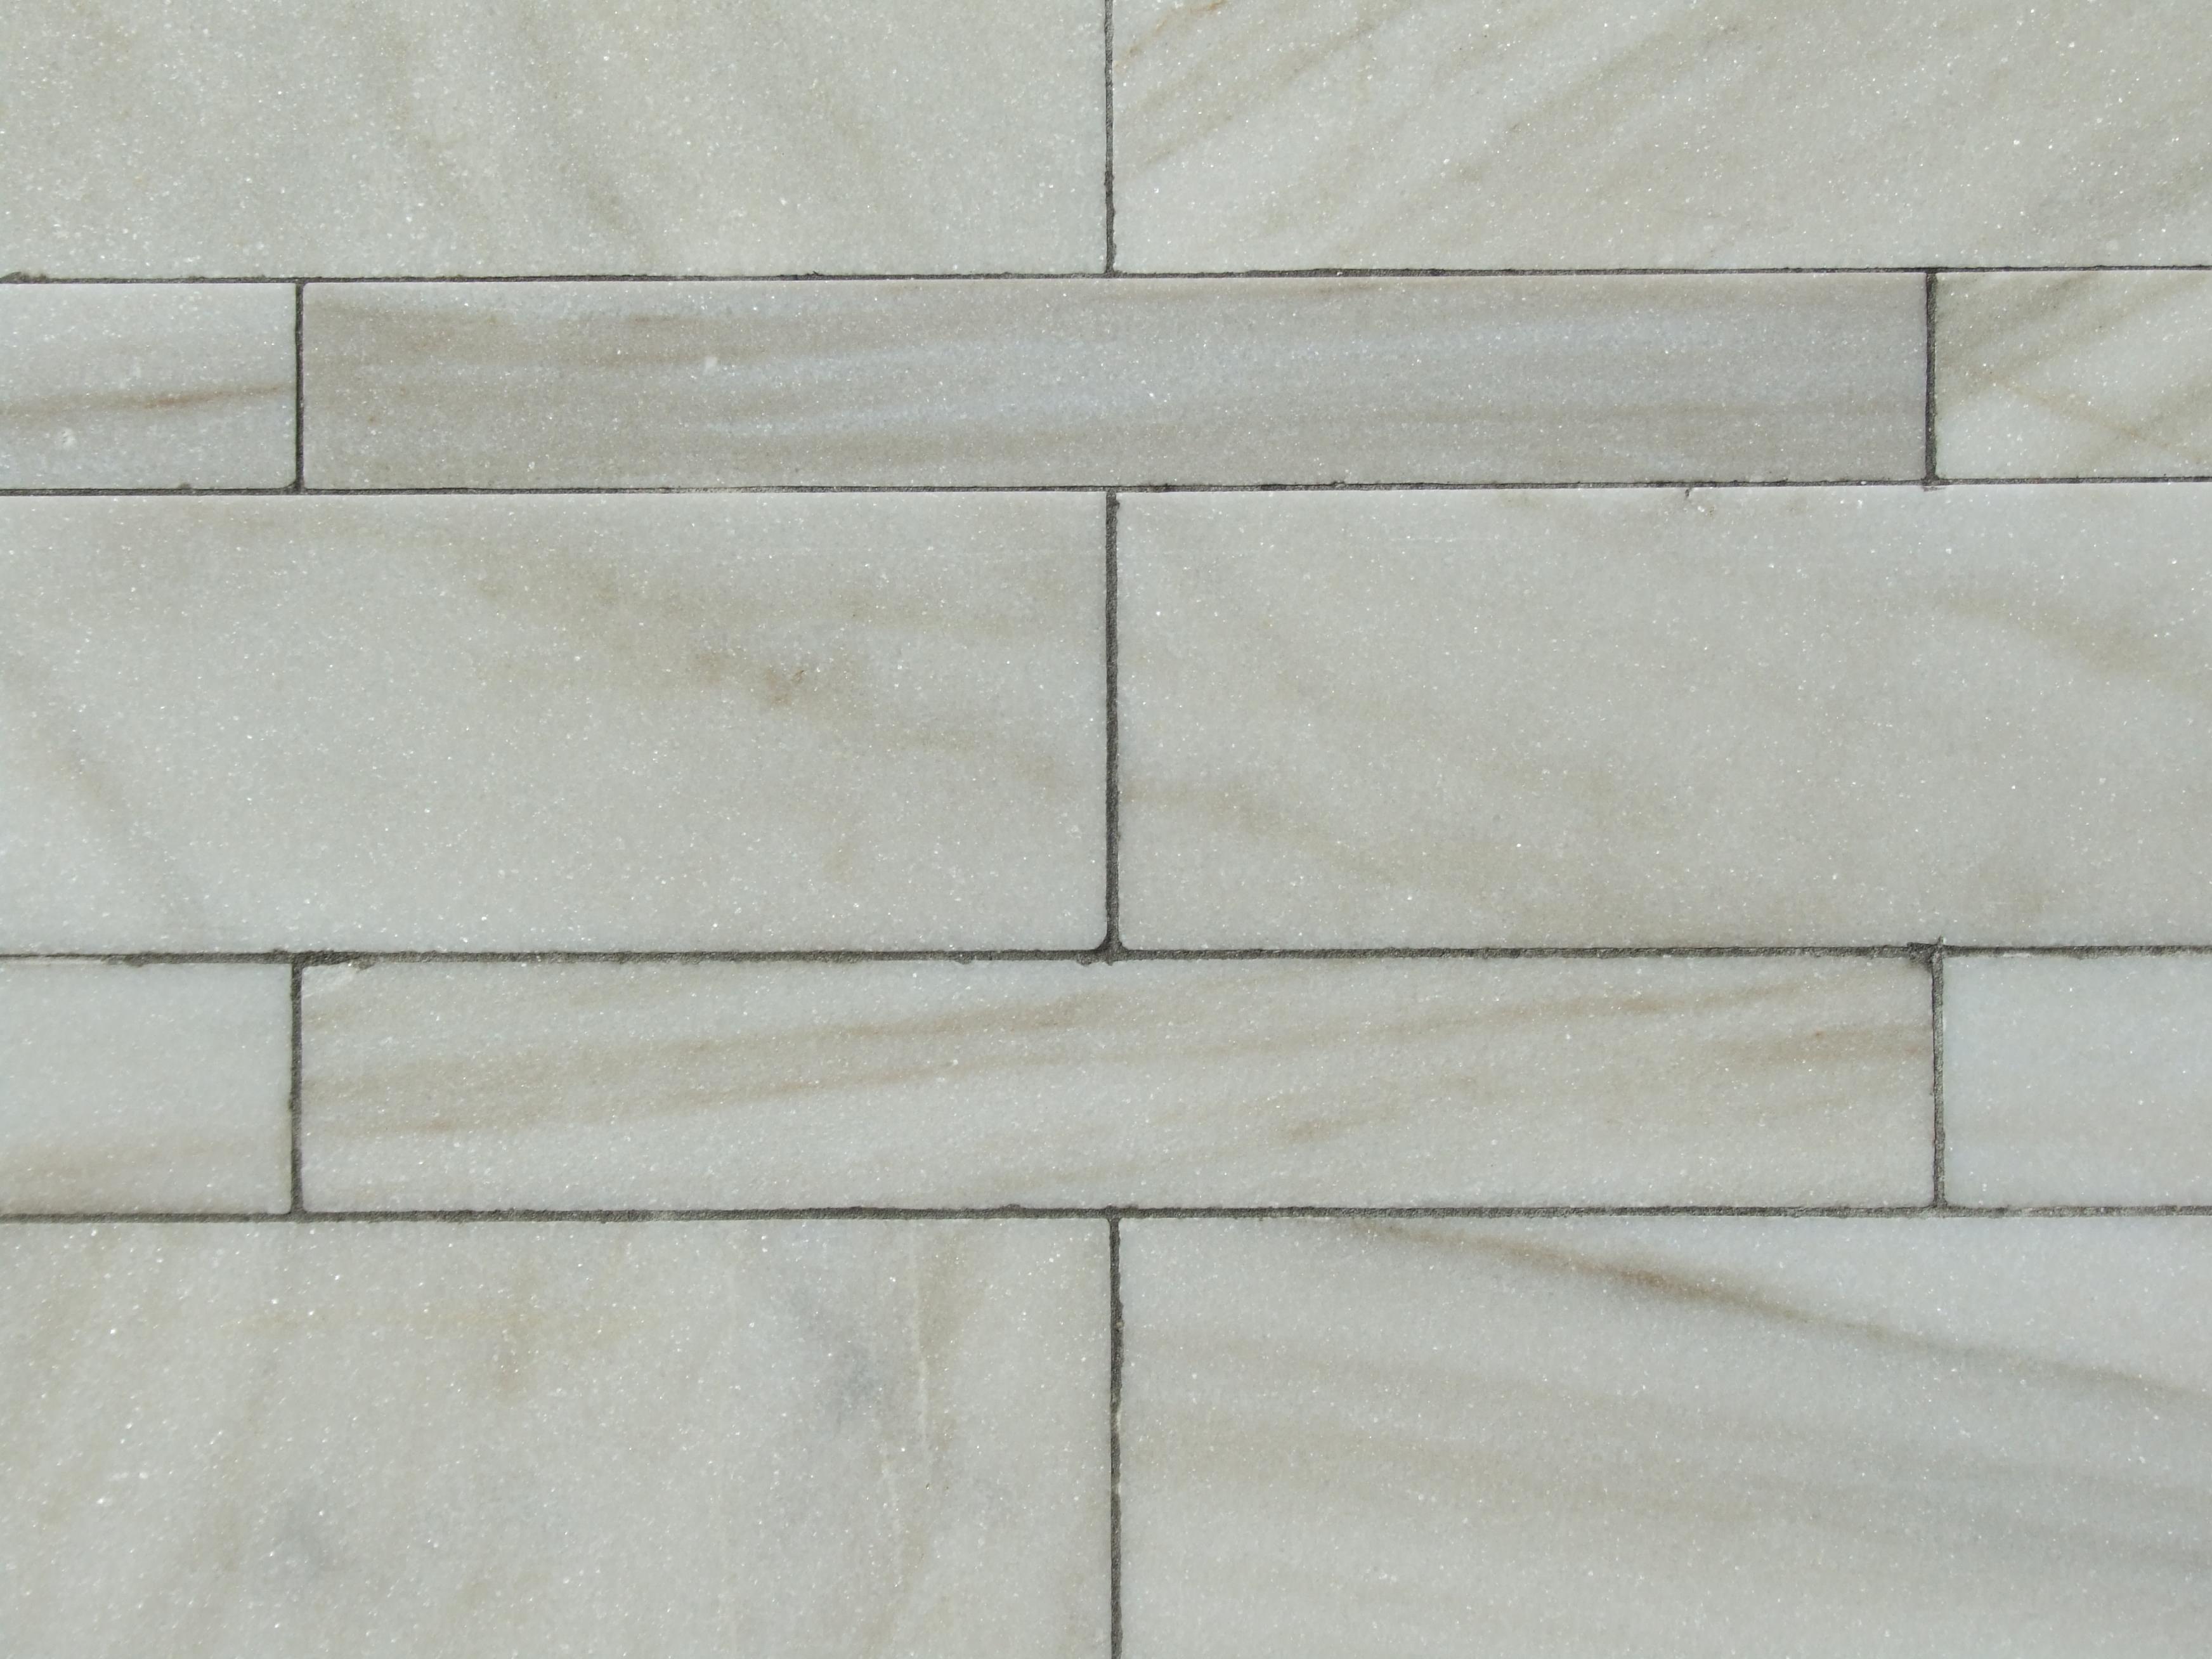 File:Marble blocks pattern.jpg - Wikimedia Commons